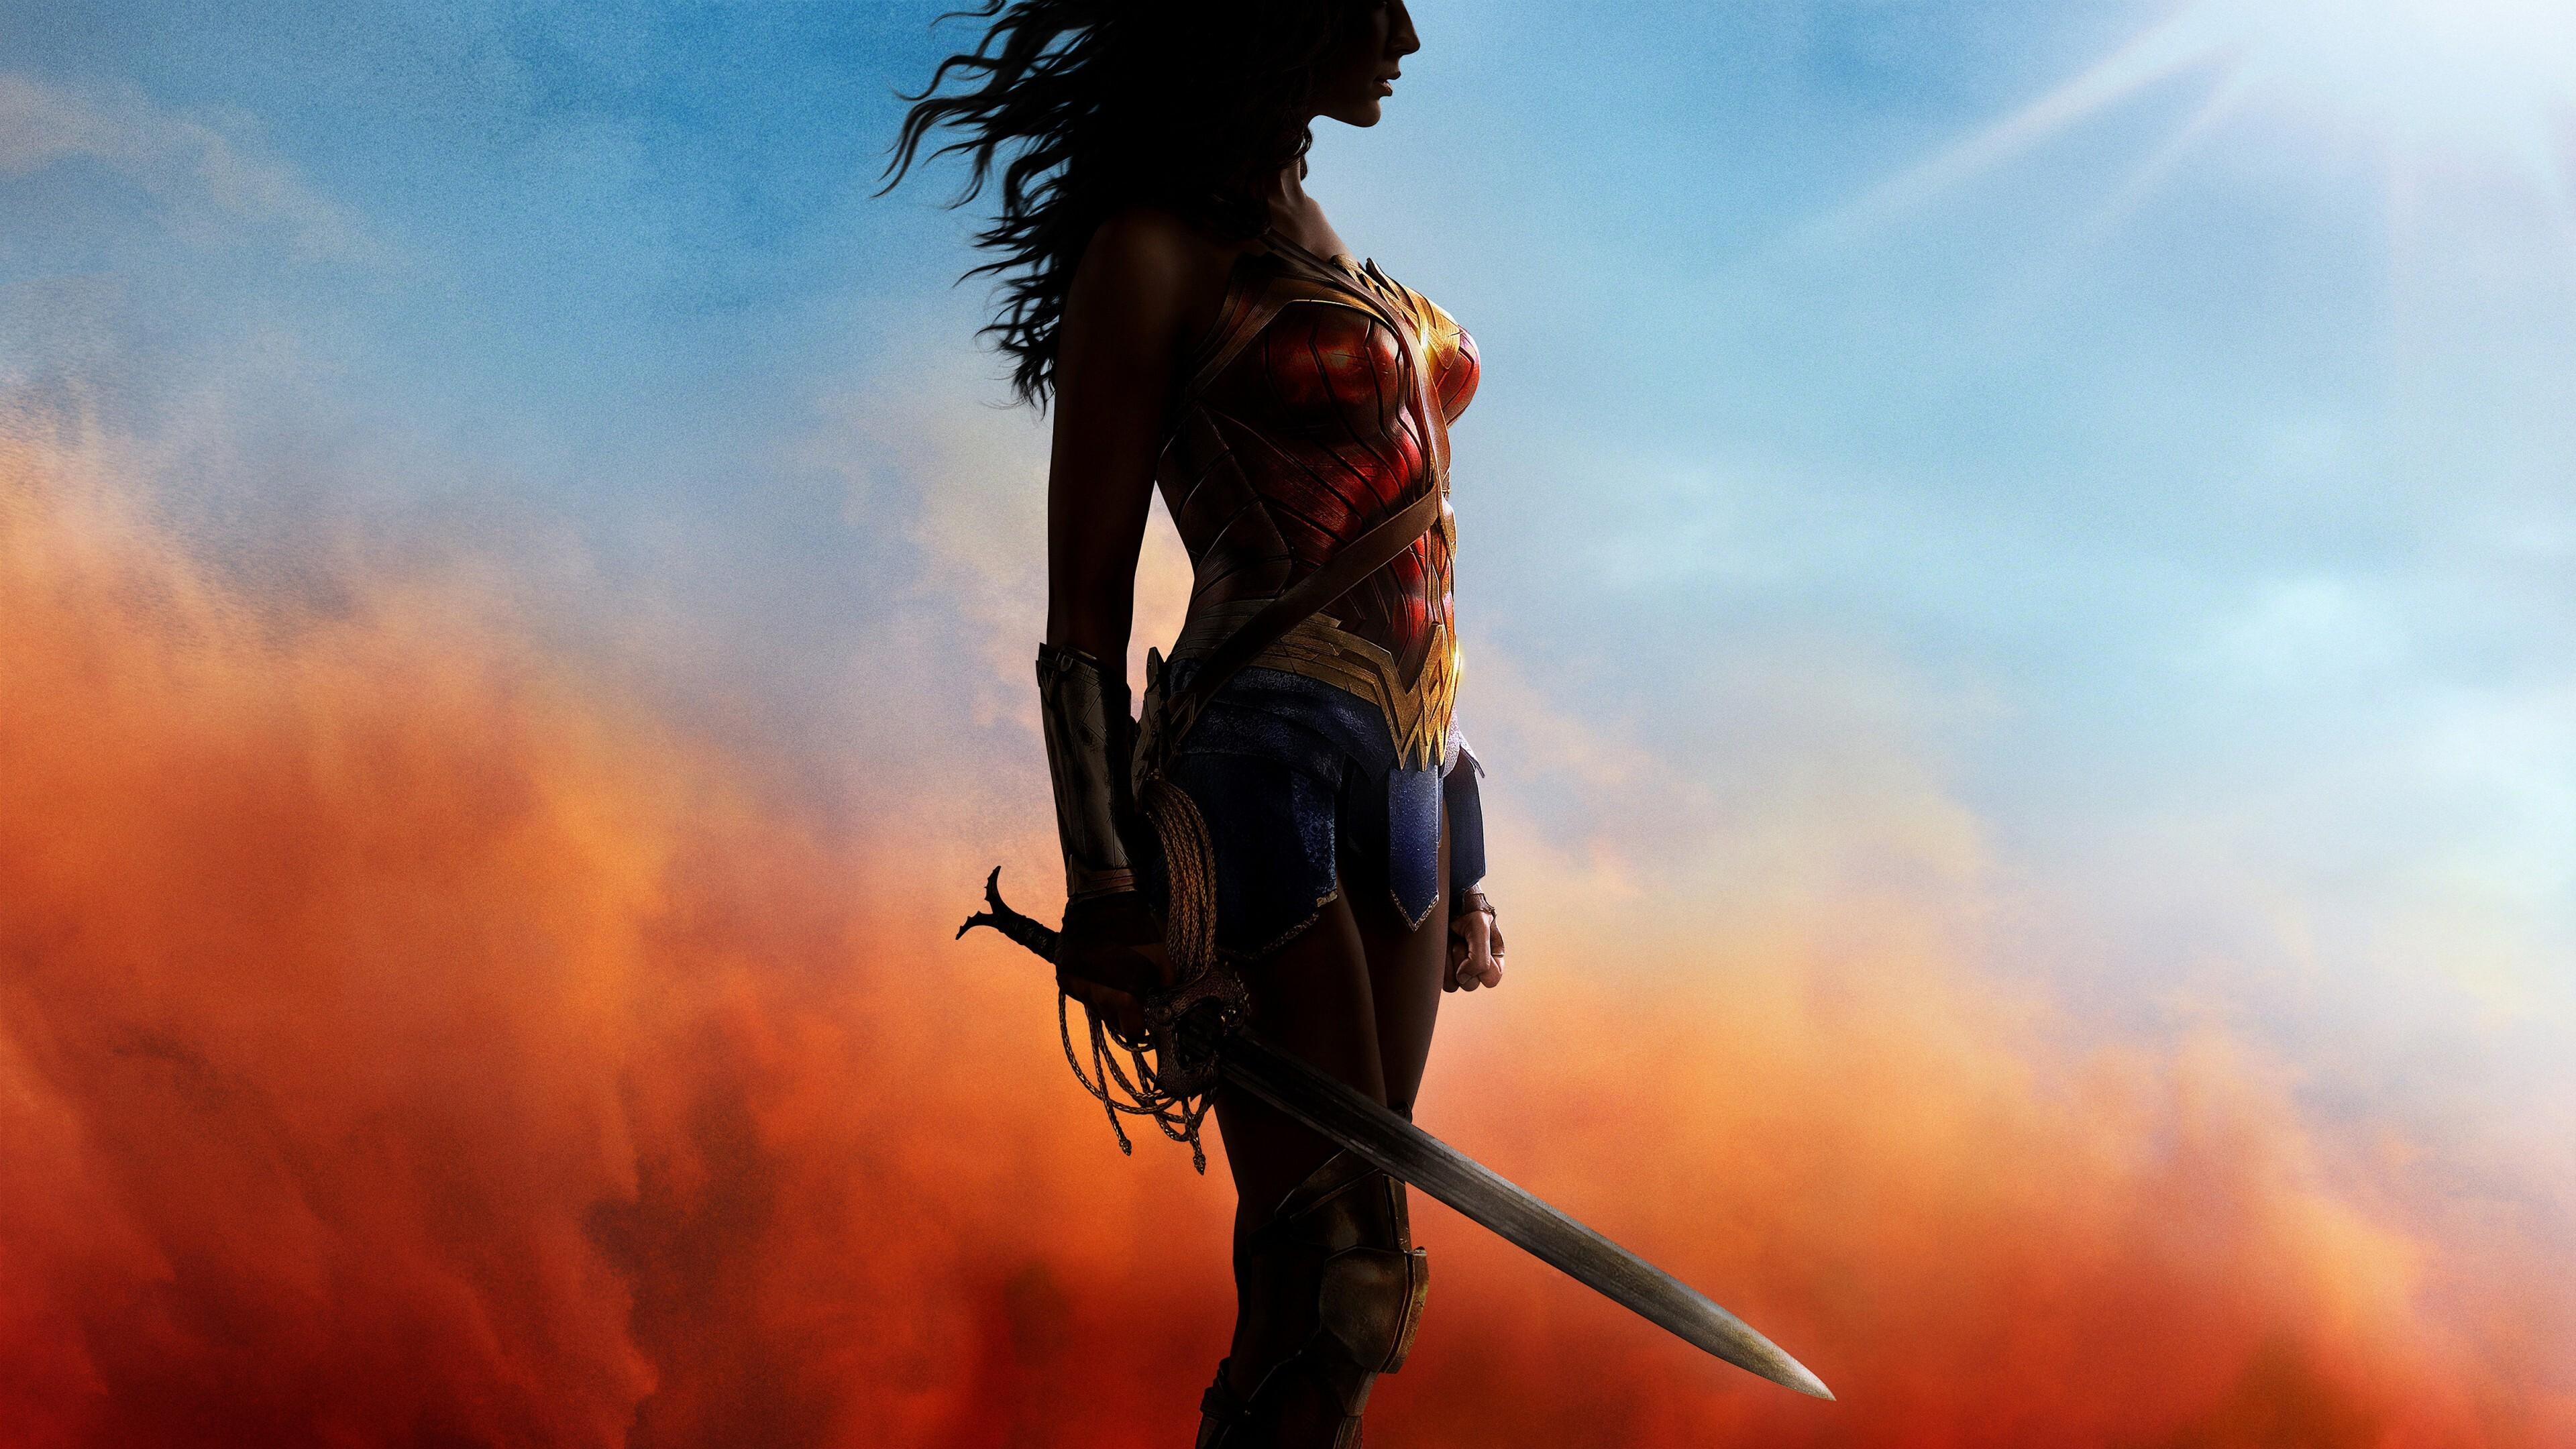 1280x1024 Wonder Woman Movie 1280x1024 Resolution Hd 4k